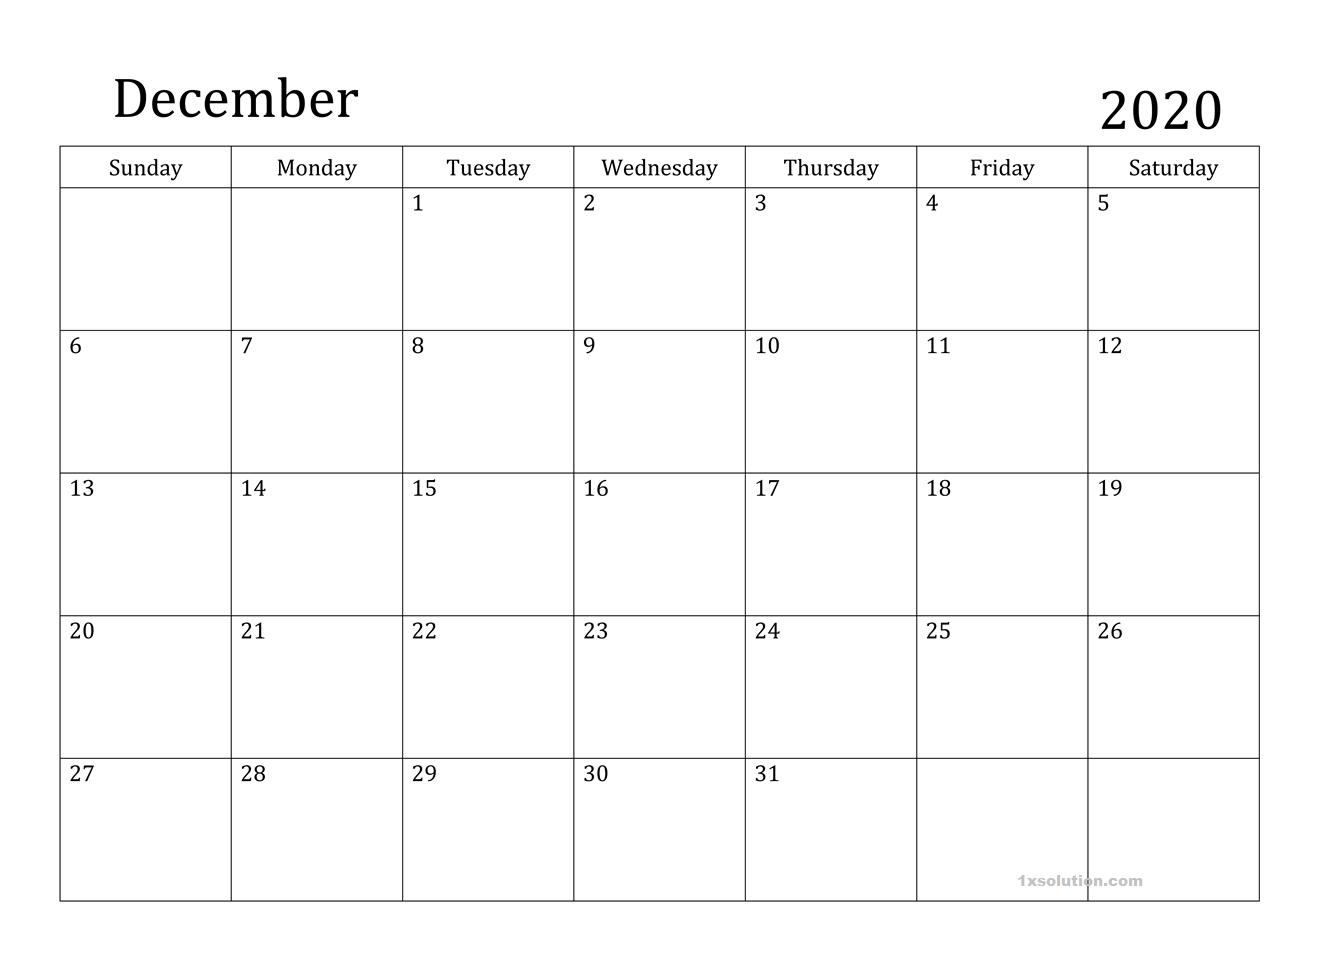 December 2020 Calendar Printable Waterproof | Calendar